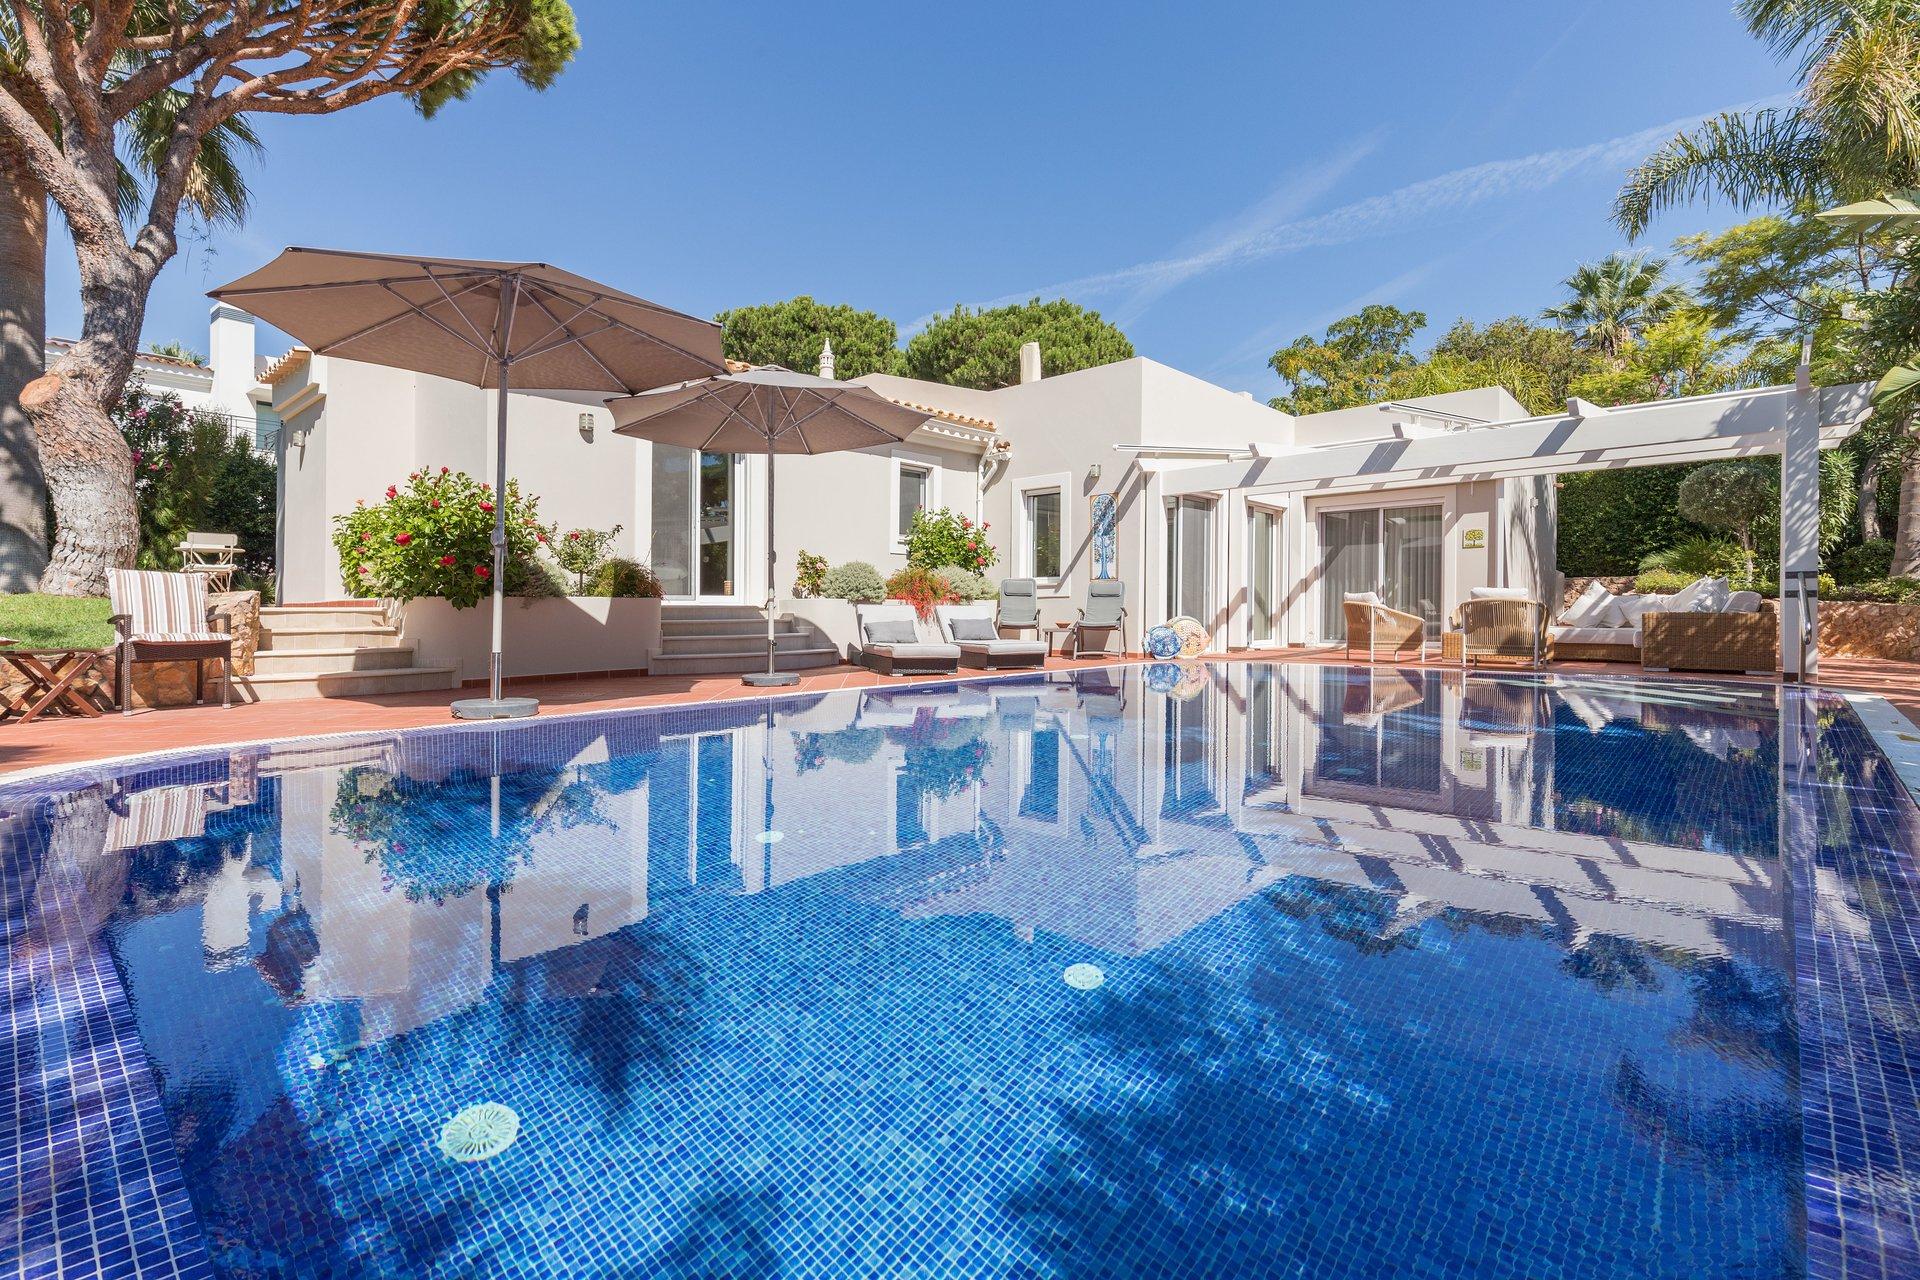 4 Bedroom Villa Almancil, Central Algarve Ref: MV23445